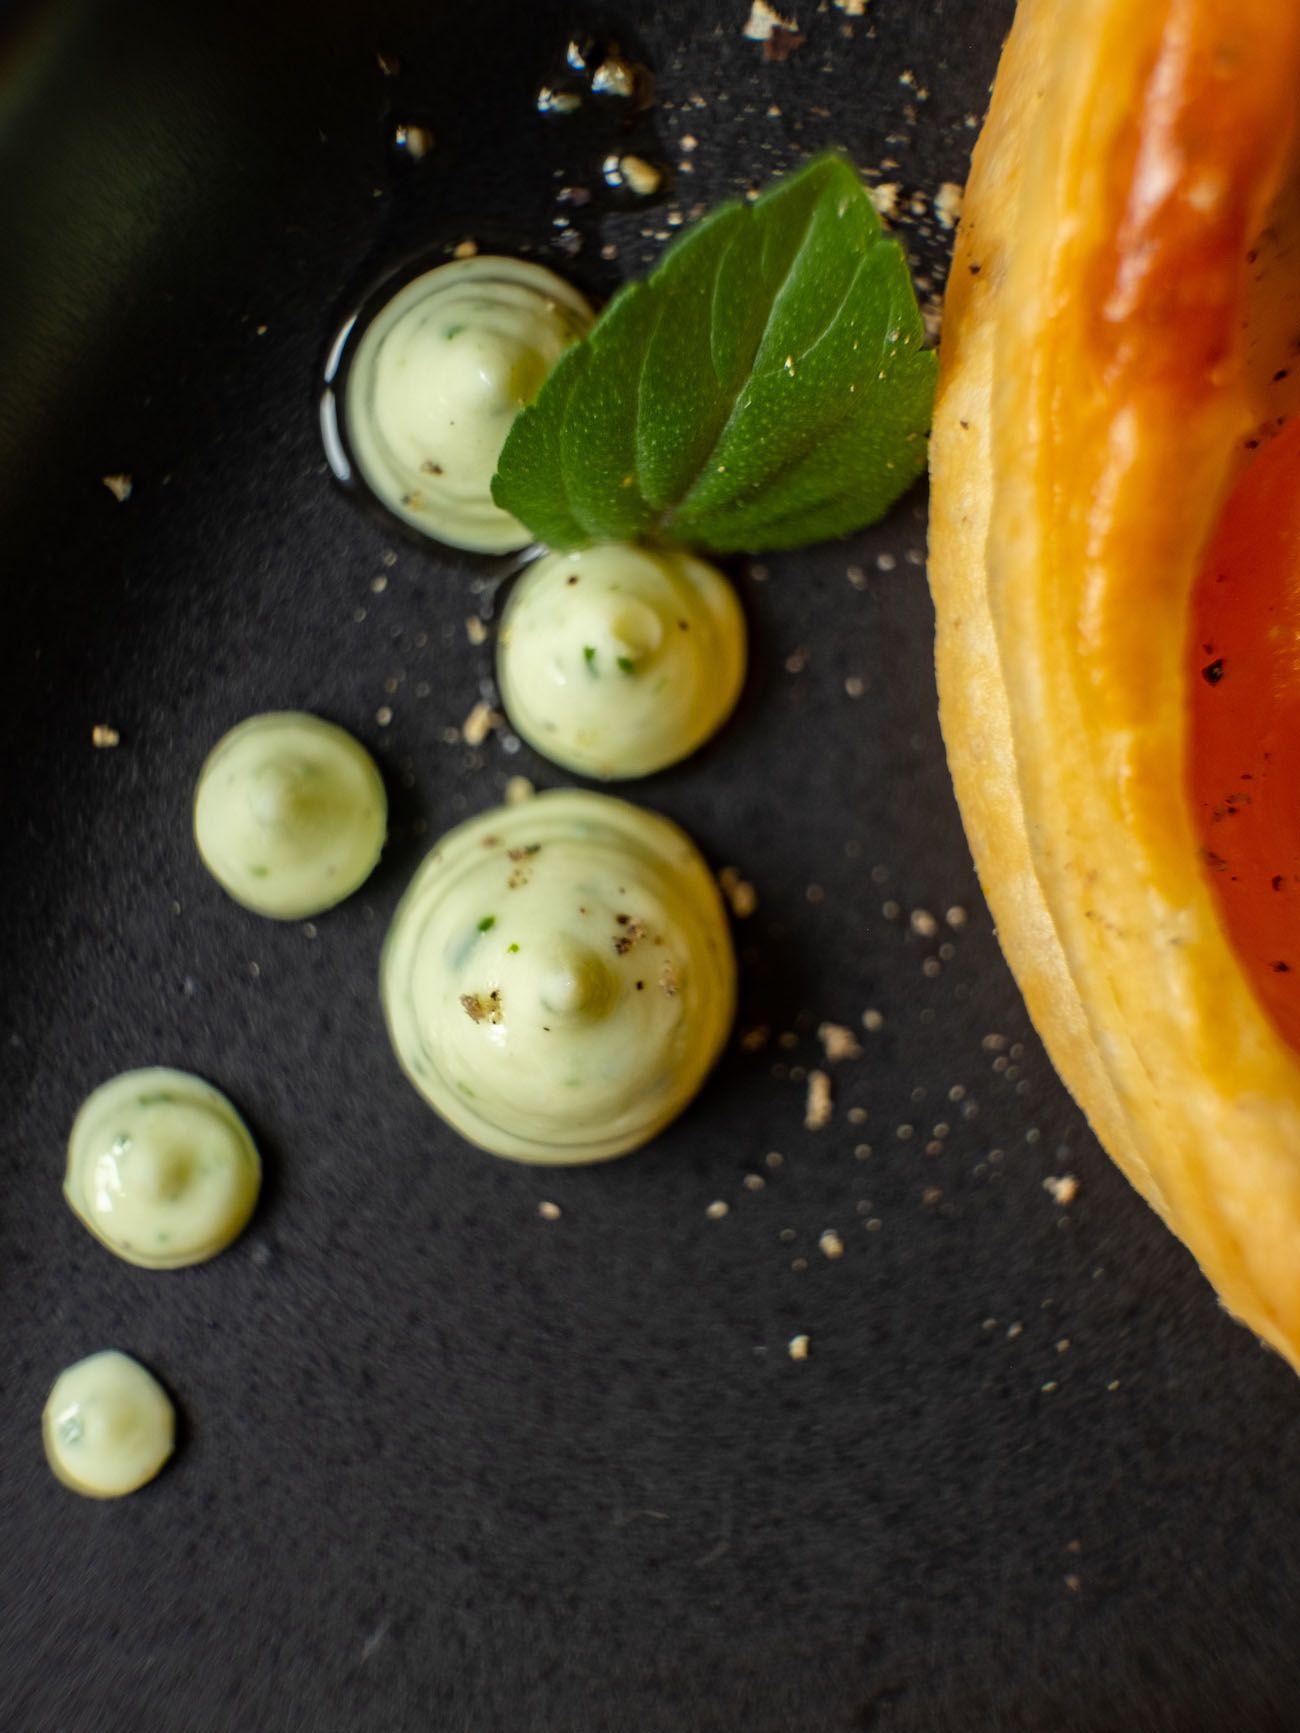 Rezept, Foodblog, About Fuel, Tomaten Zucchini Tartelettes mit Basilikum Feta Creme, Pfeffer